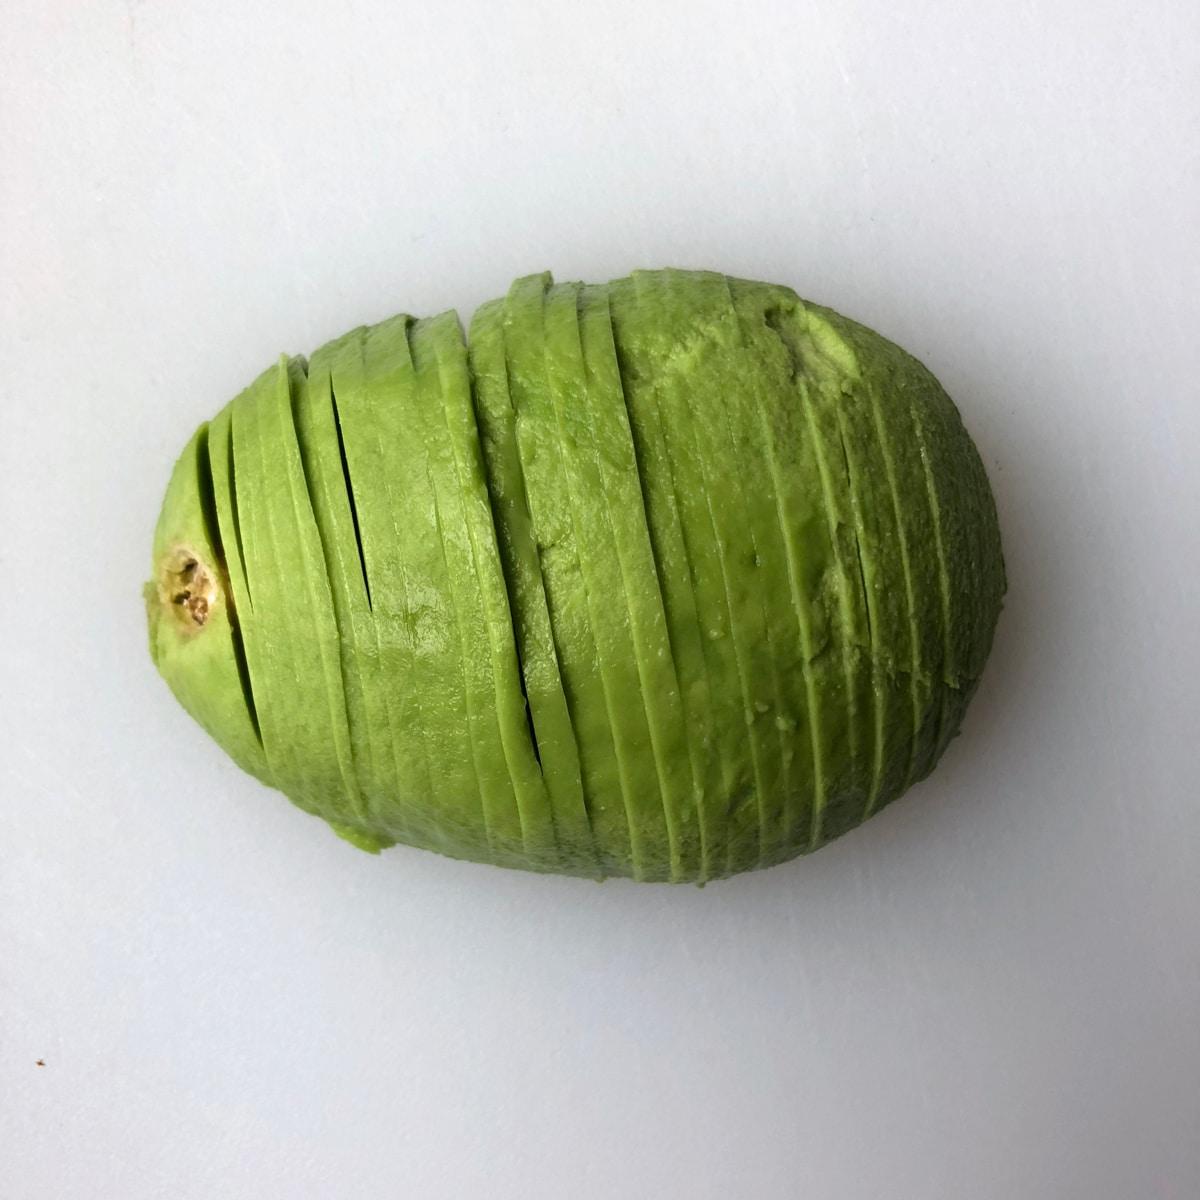 photo of sliced avocado